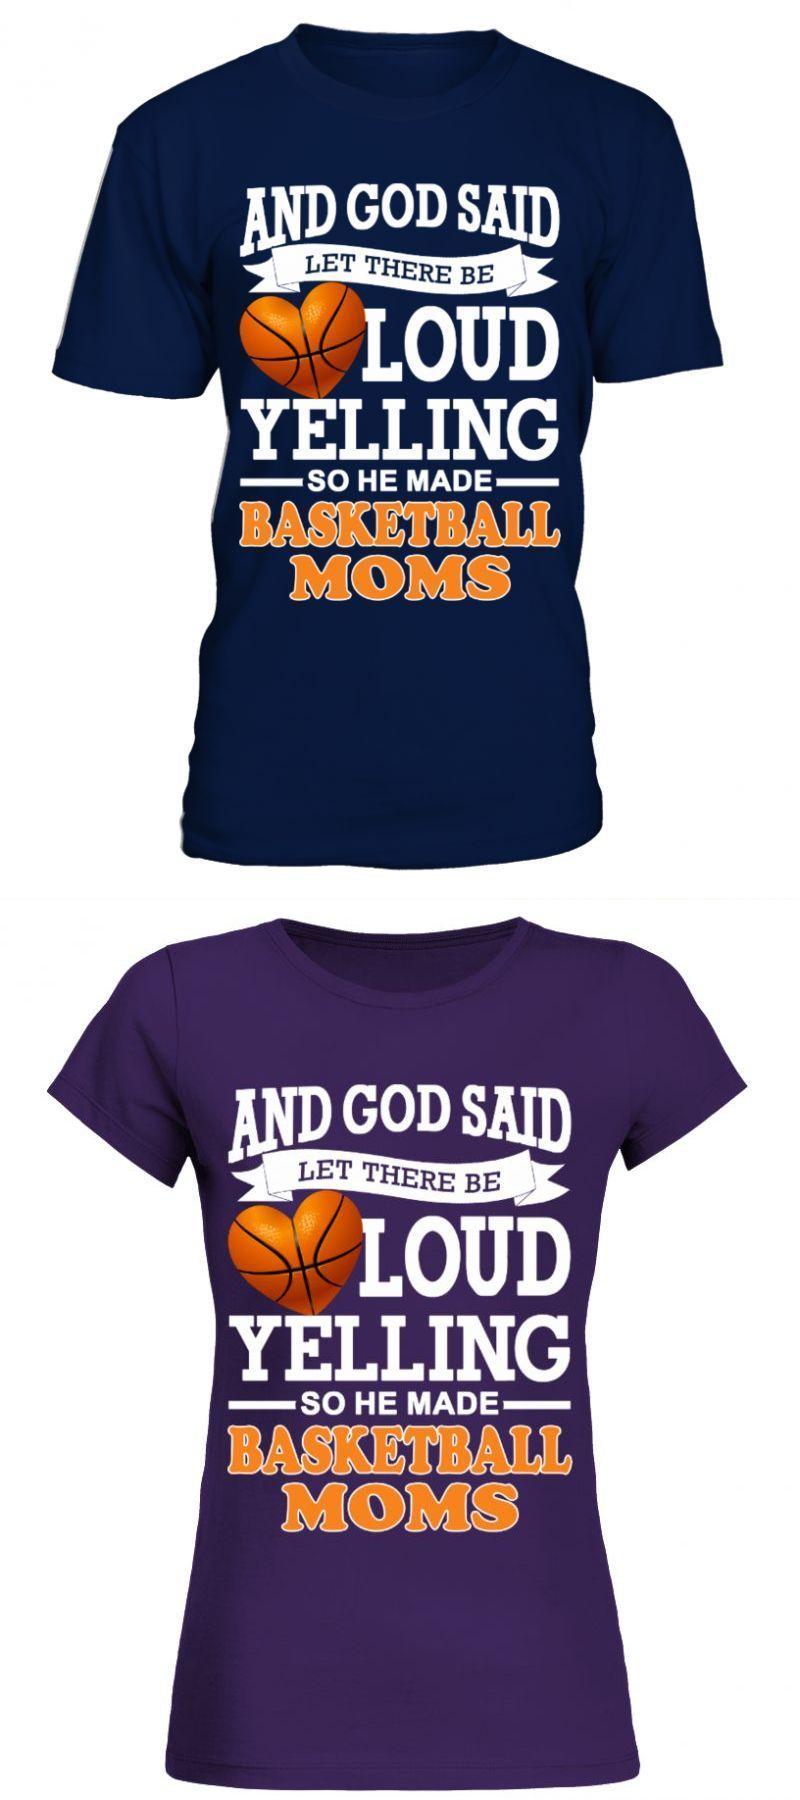 Uva Basketball T Shirt God Made Basketball Moms Basketball Camp T Shirt Ideas Uva Basketball Shirt Go Basketball T Shirt Designs Balls Shirt Basketball Mom